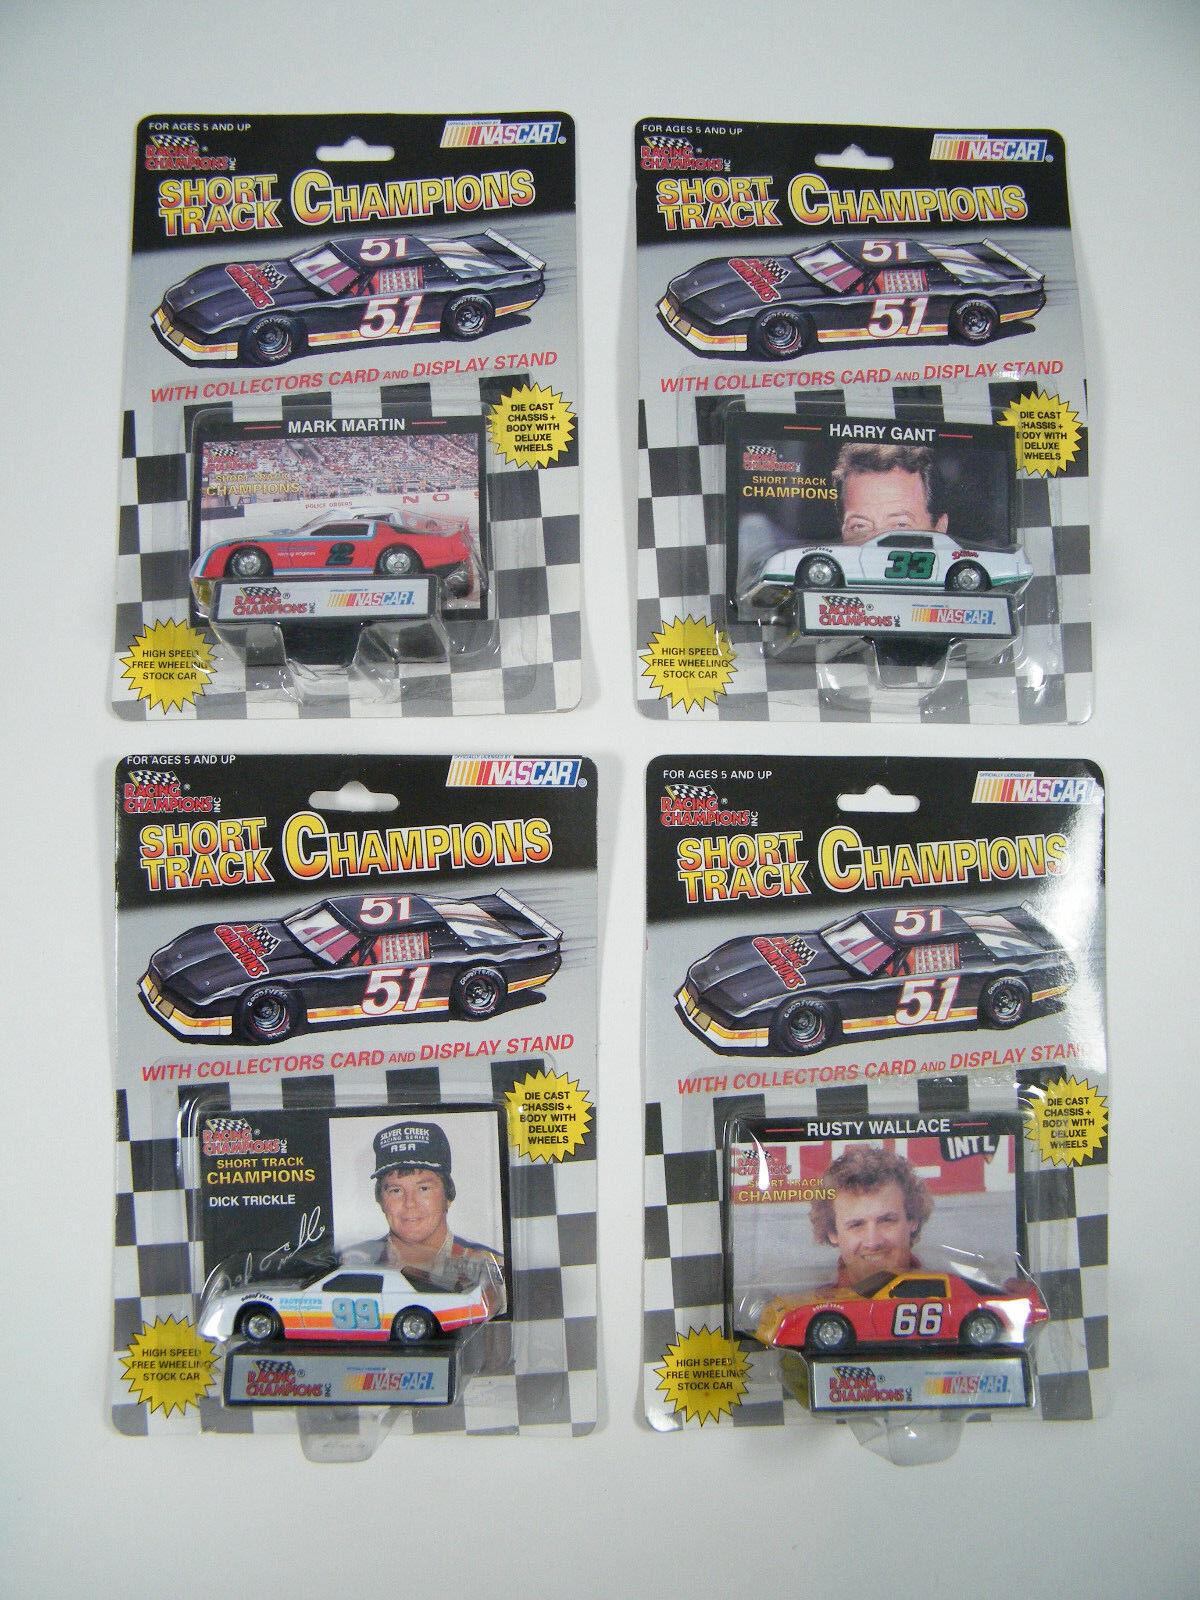 (4) nueva en paquete pista corta NasCoche Racing Champions-Wallace, GANT, Martin, goteo